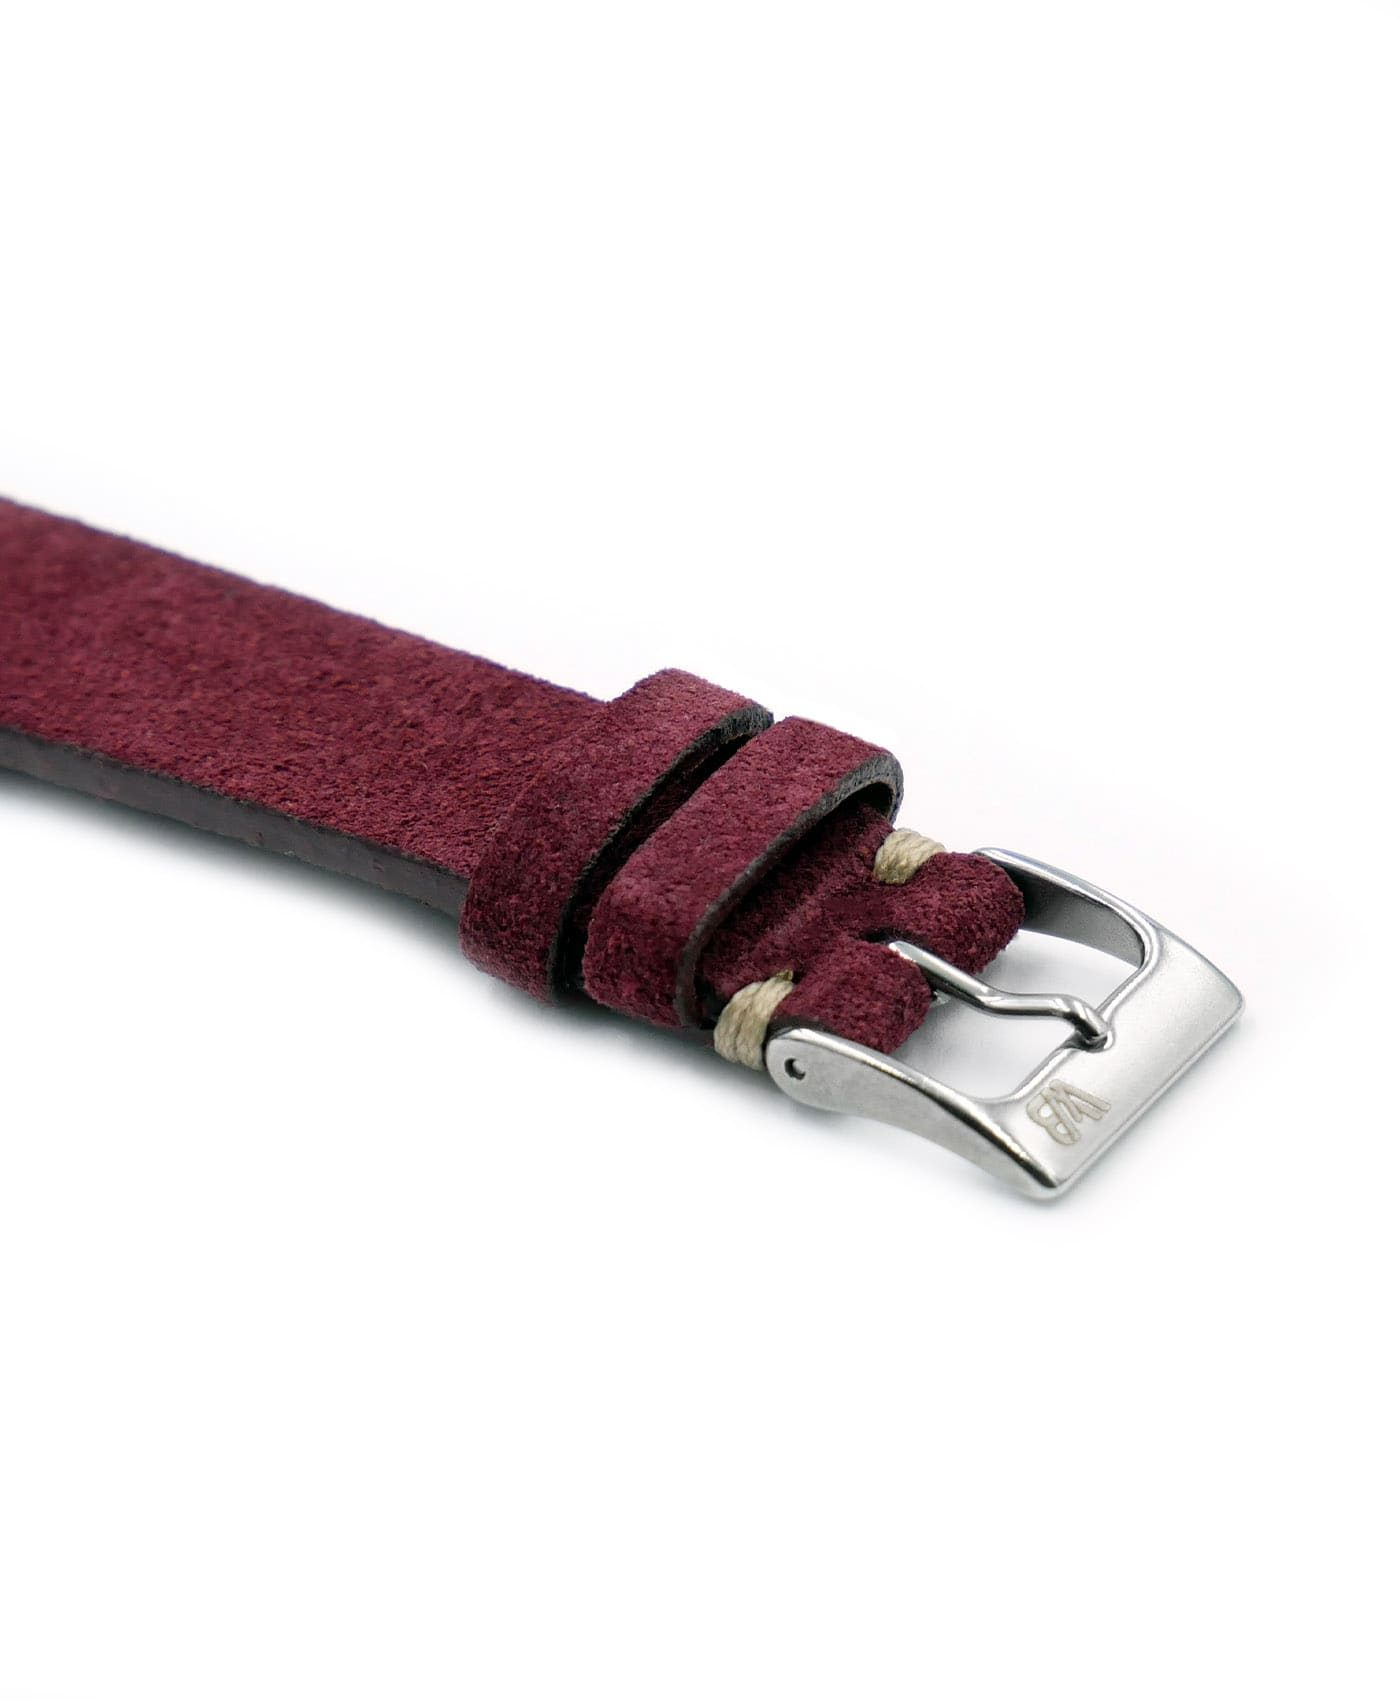 WB original premium suede watch strap burgundy bordeaux red side buckle